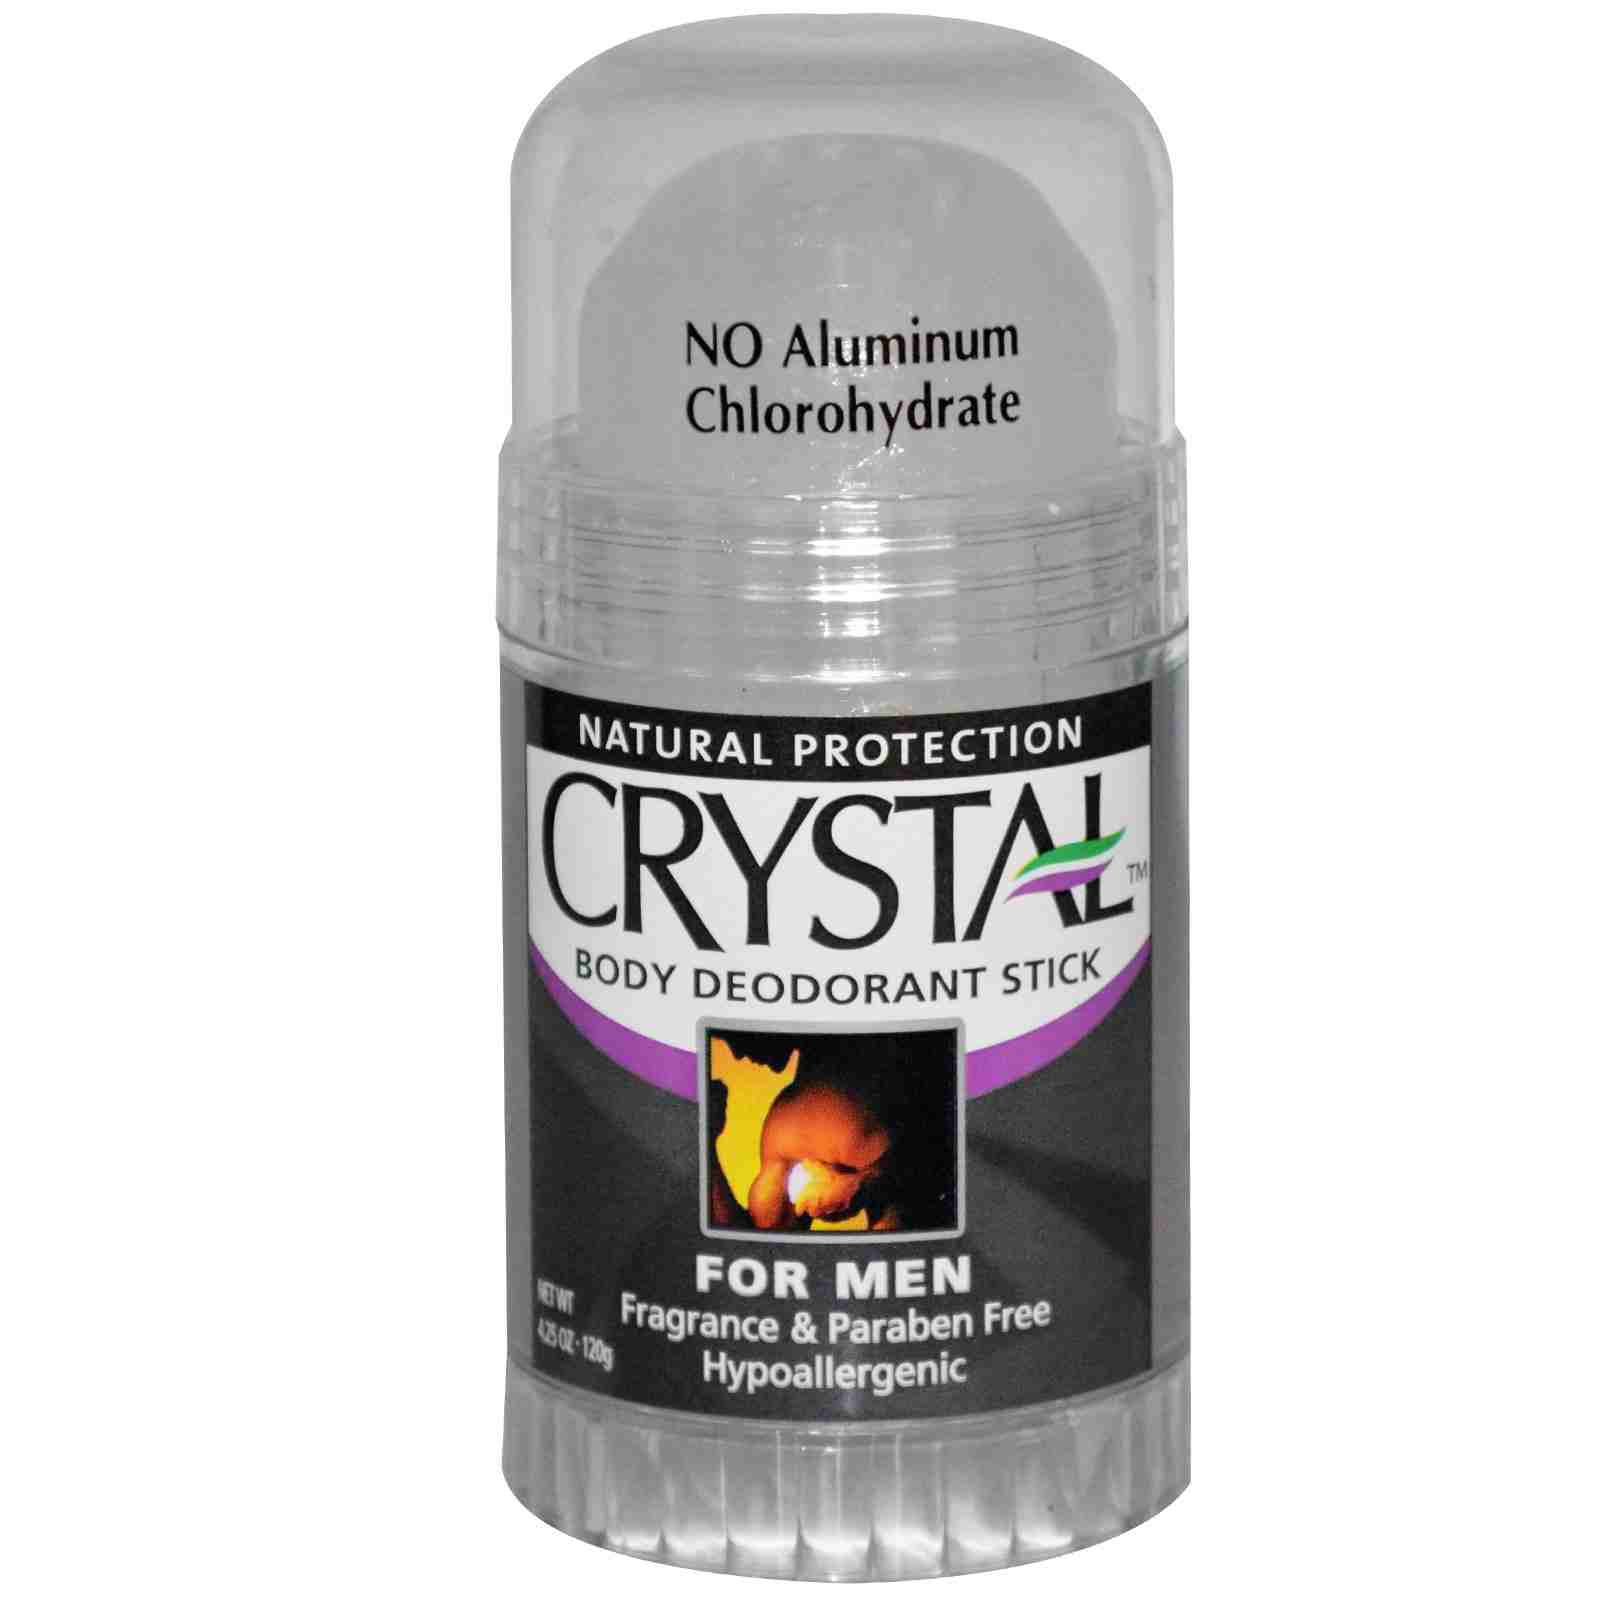 Best Antiperspirant For Men: Best Natural Deodorant Products For Men